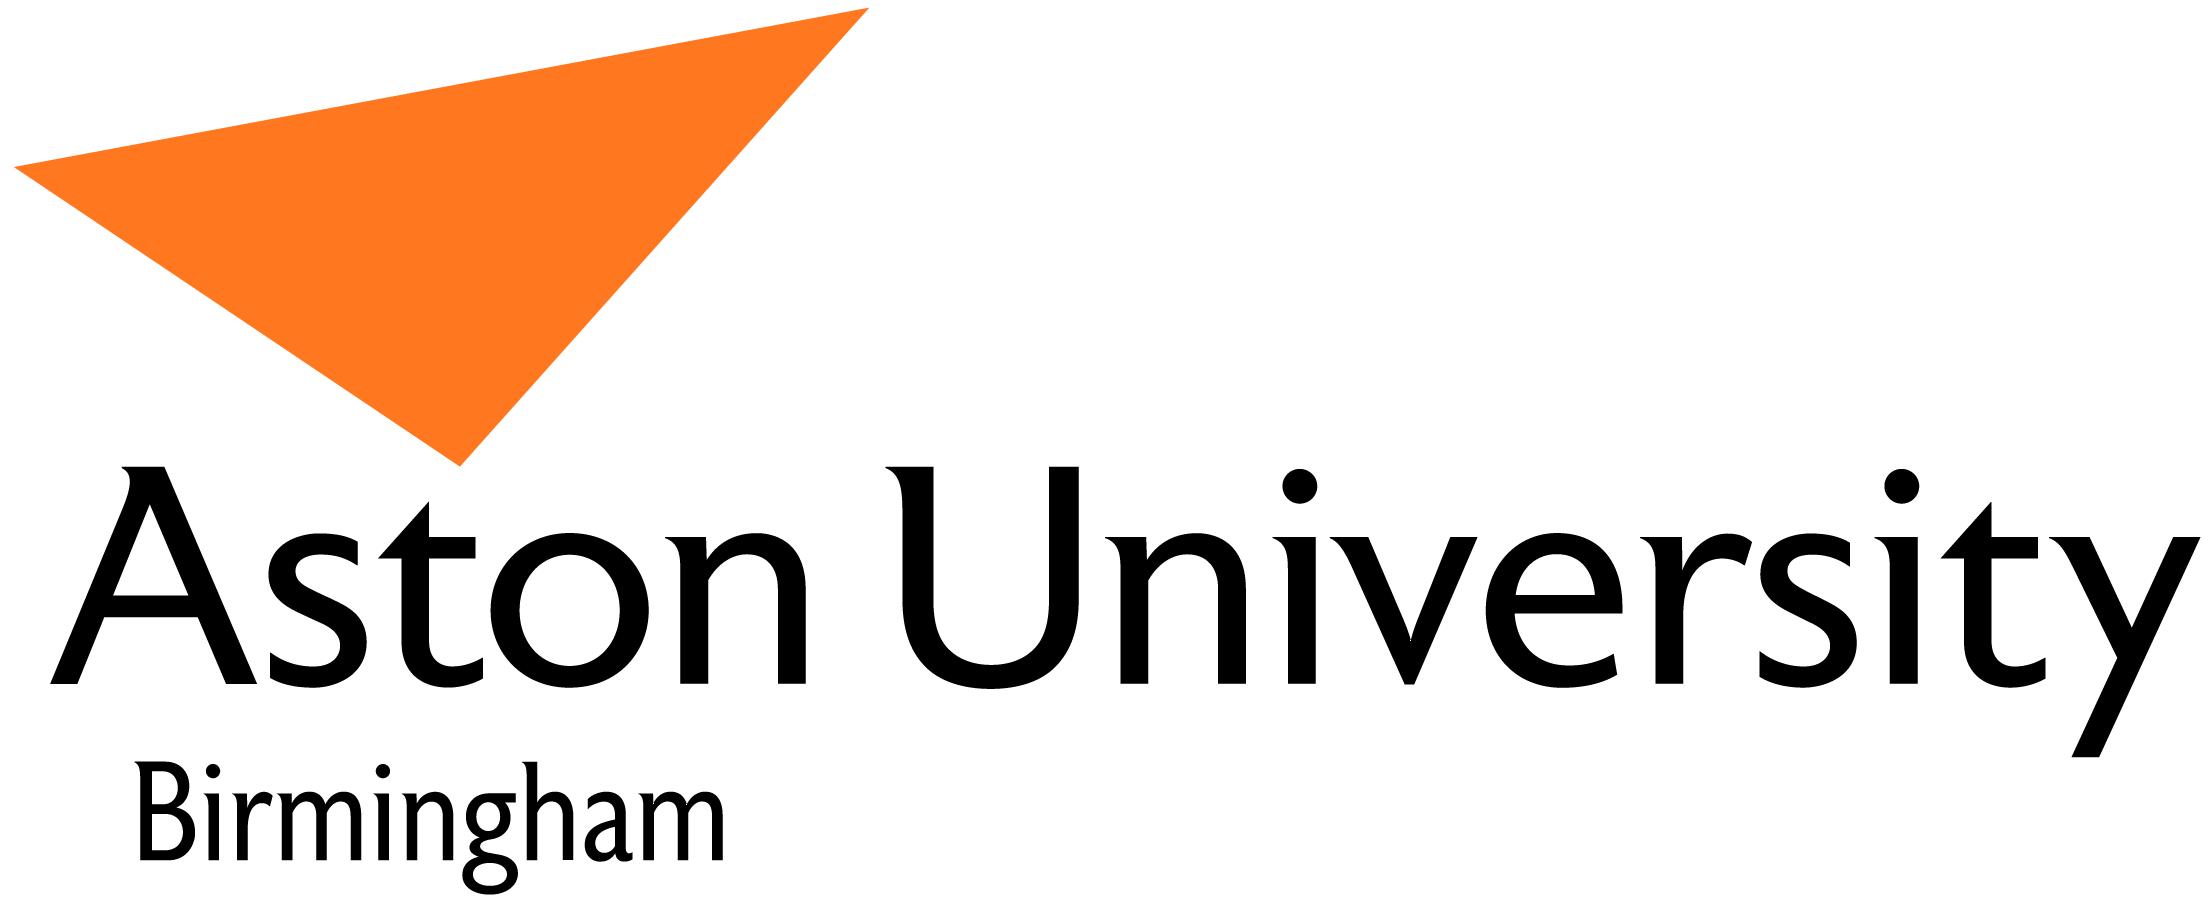 Aston Univeristy Birmingham Logo